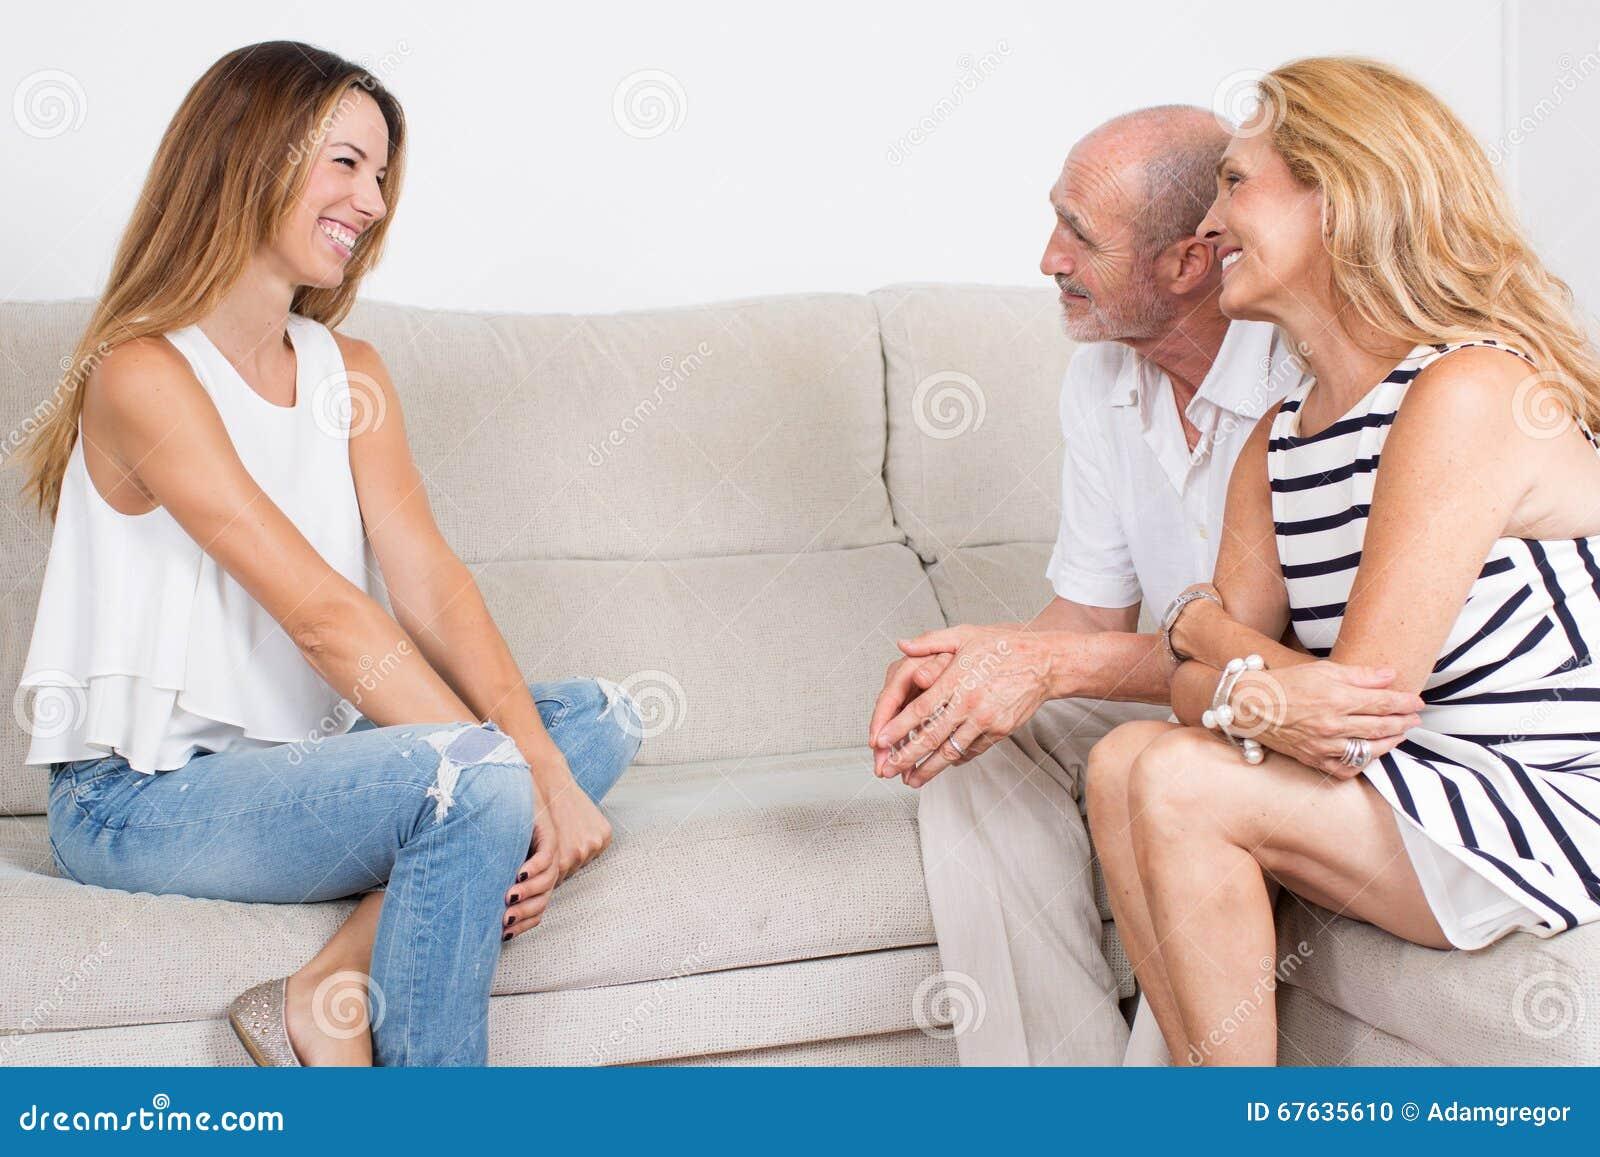 Titta blinda dating online viooz